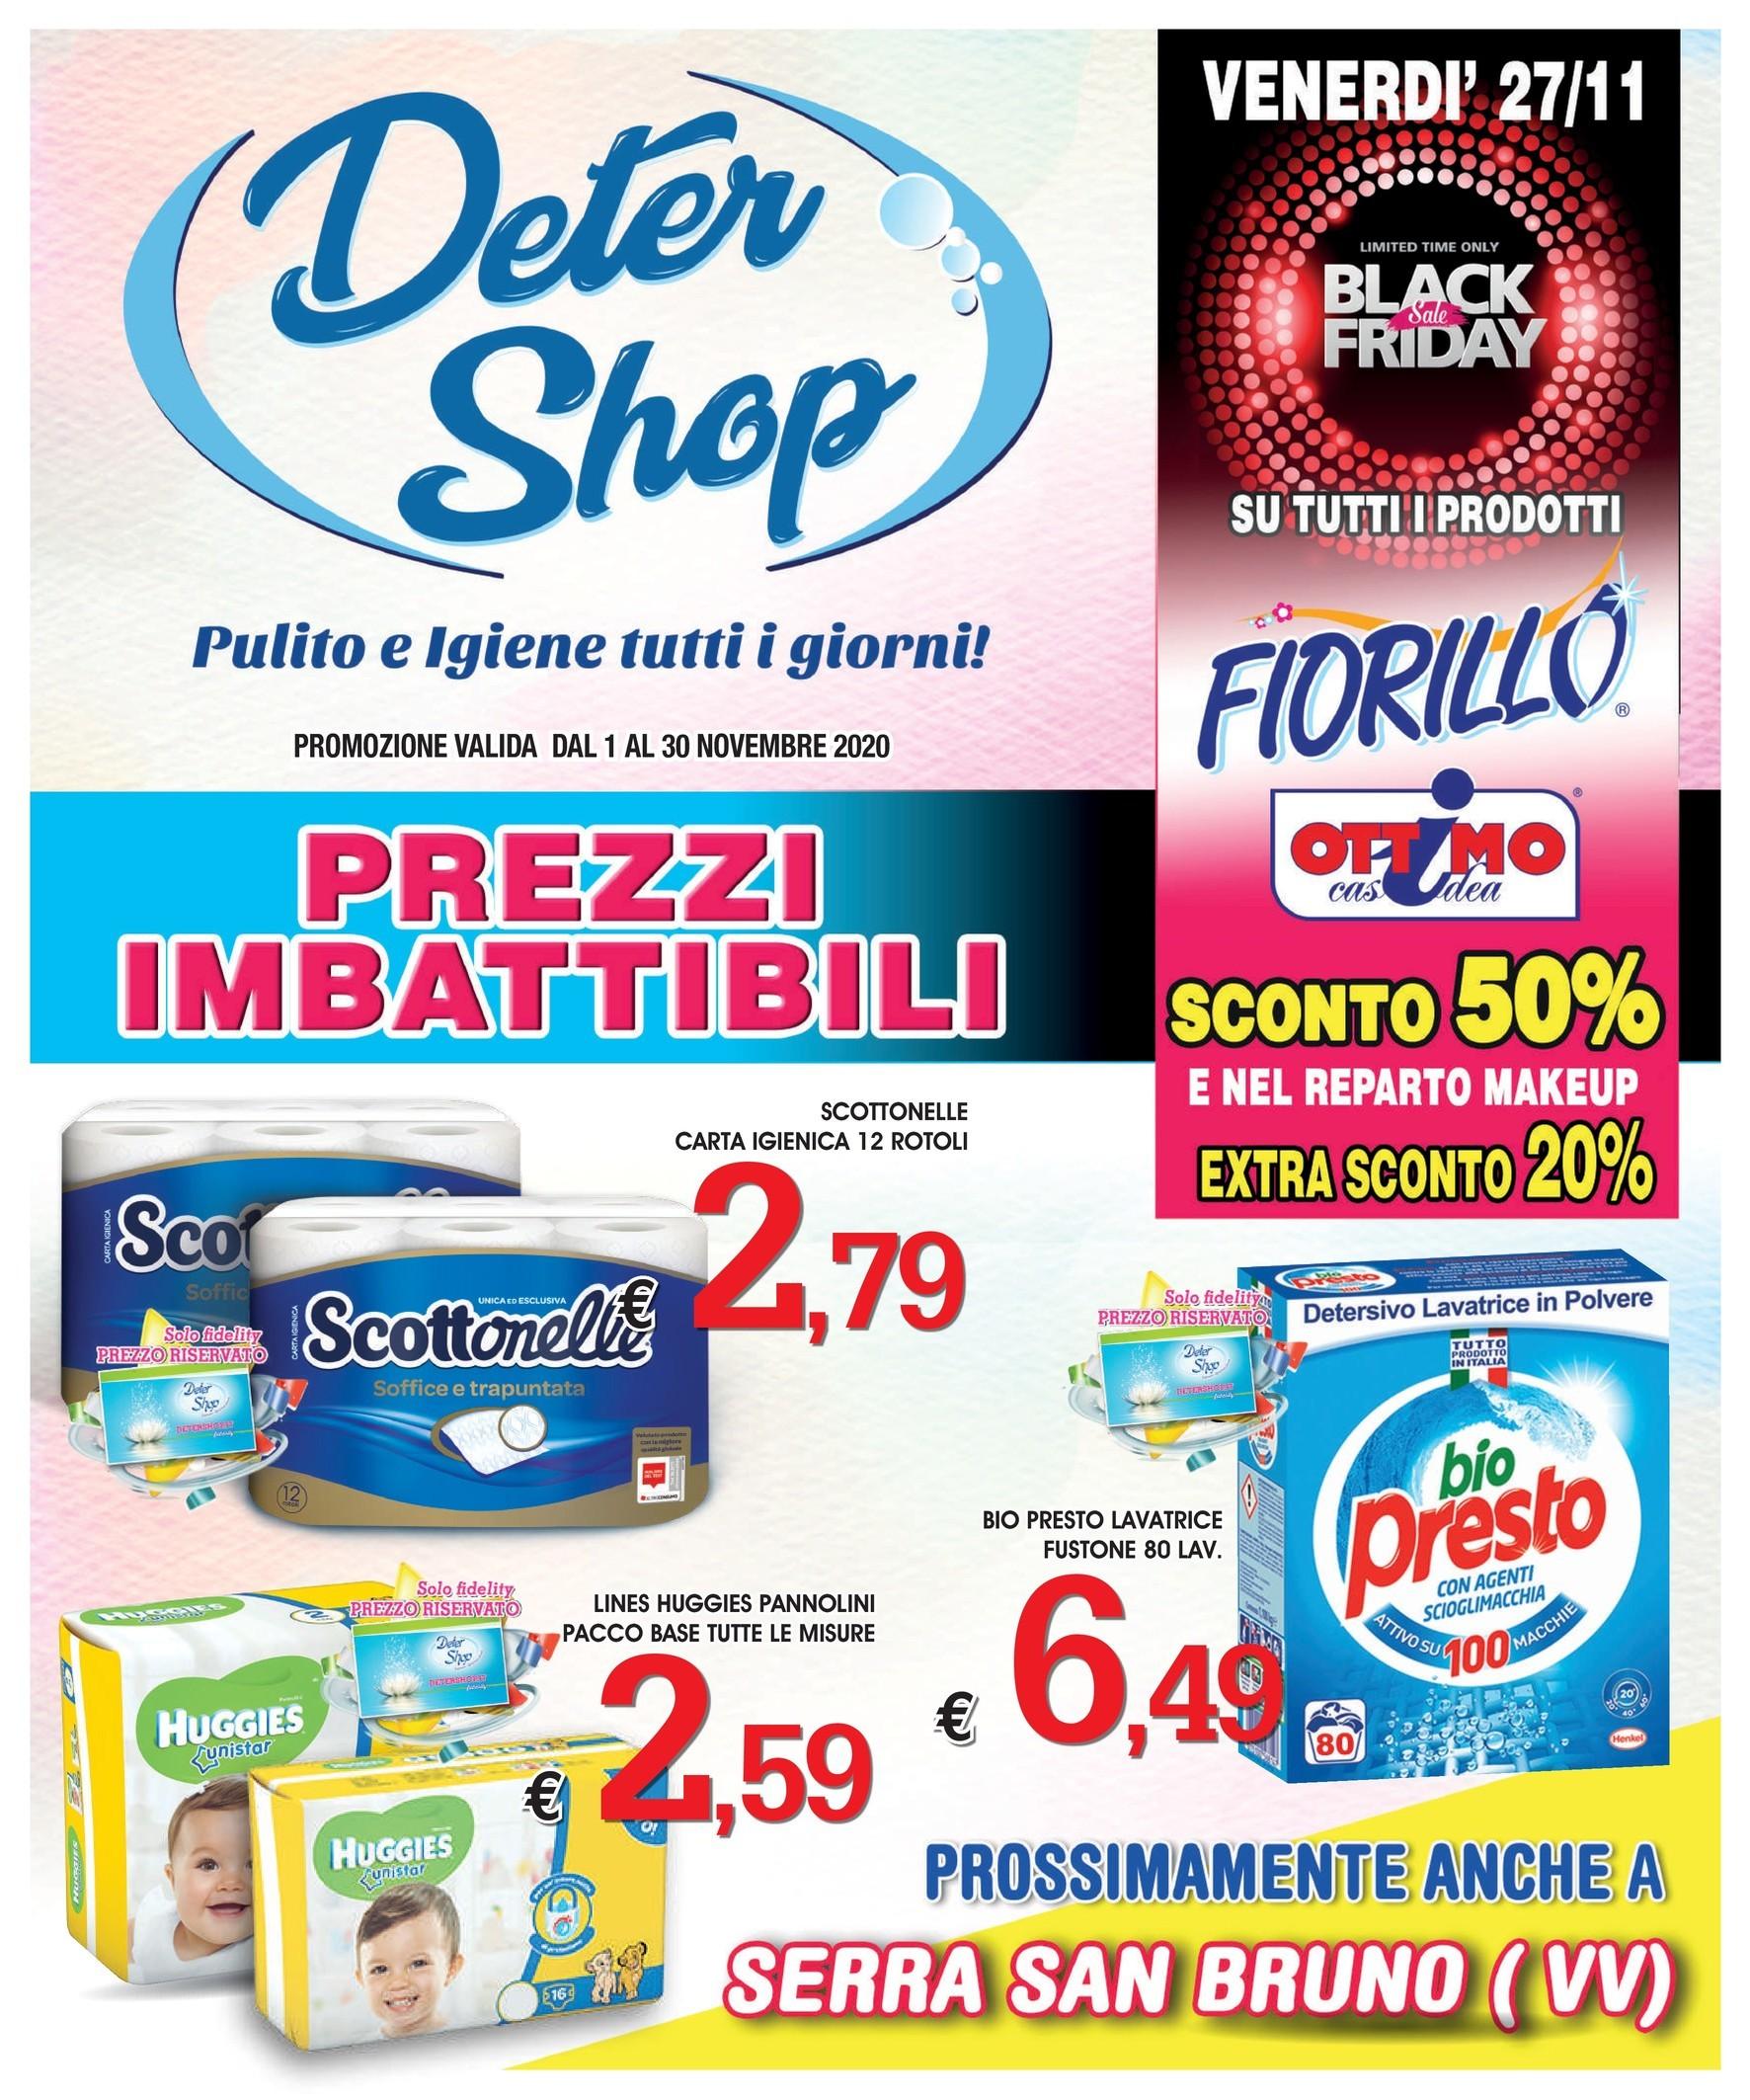 Volantino Deter Shop A Rossano Offerte Negozi E Orari